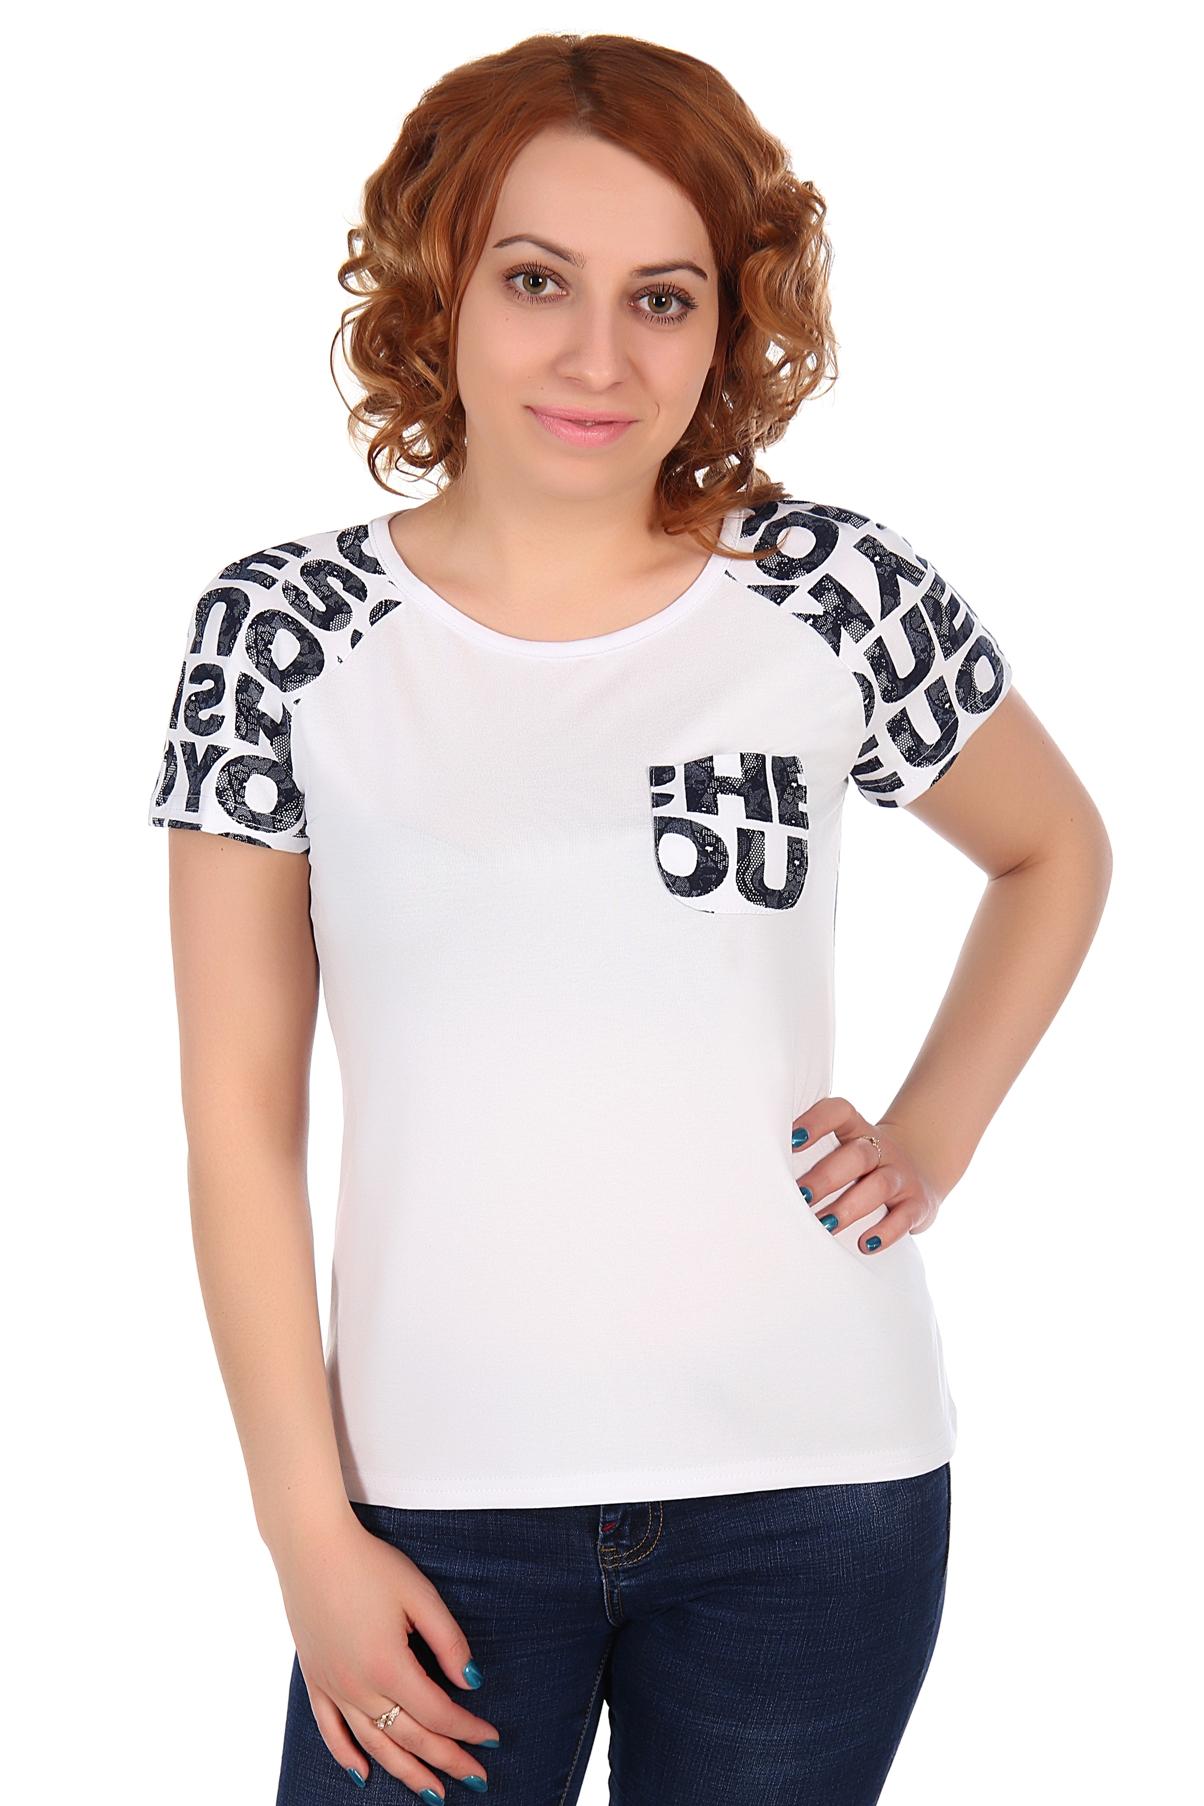 Жен. футболка арт. 16-0310 Белый р. 56Майки и футболки<br>Факт. ОГ: 108 см <br>Факт. ОТ: 102 см <br>Факт. ОБ: 114 см <br>Длина по спинке: 65 см<br><br>Тип: Жен. футболка<br>Размер: 56<br>Материал: Вискоза